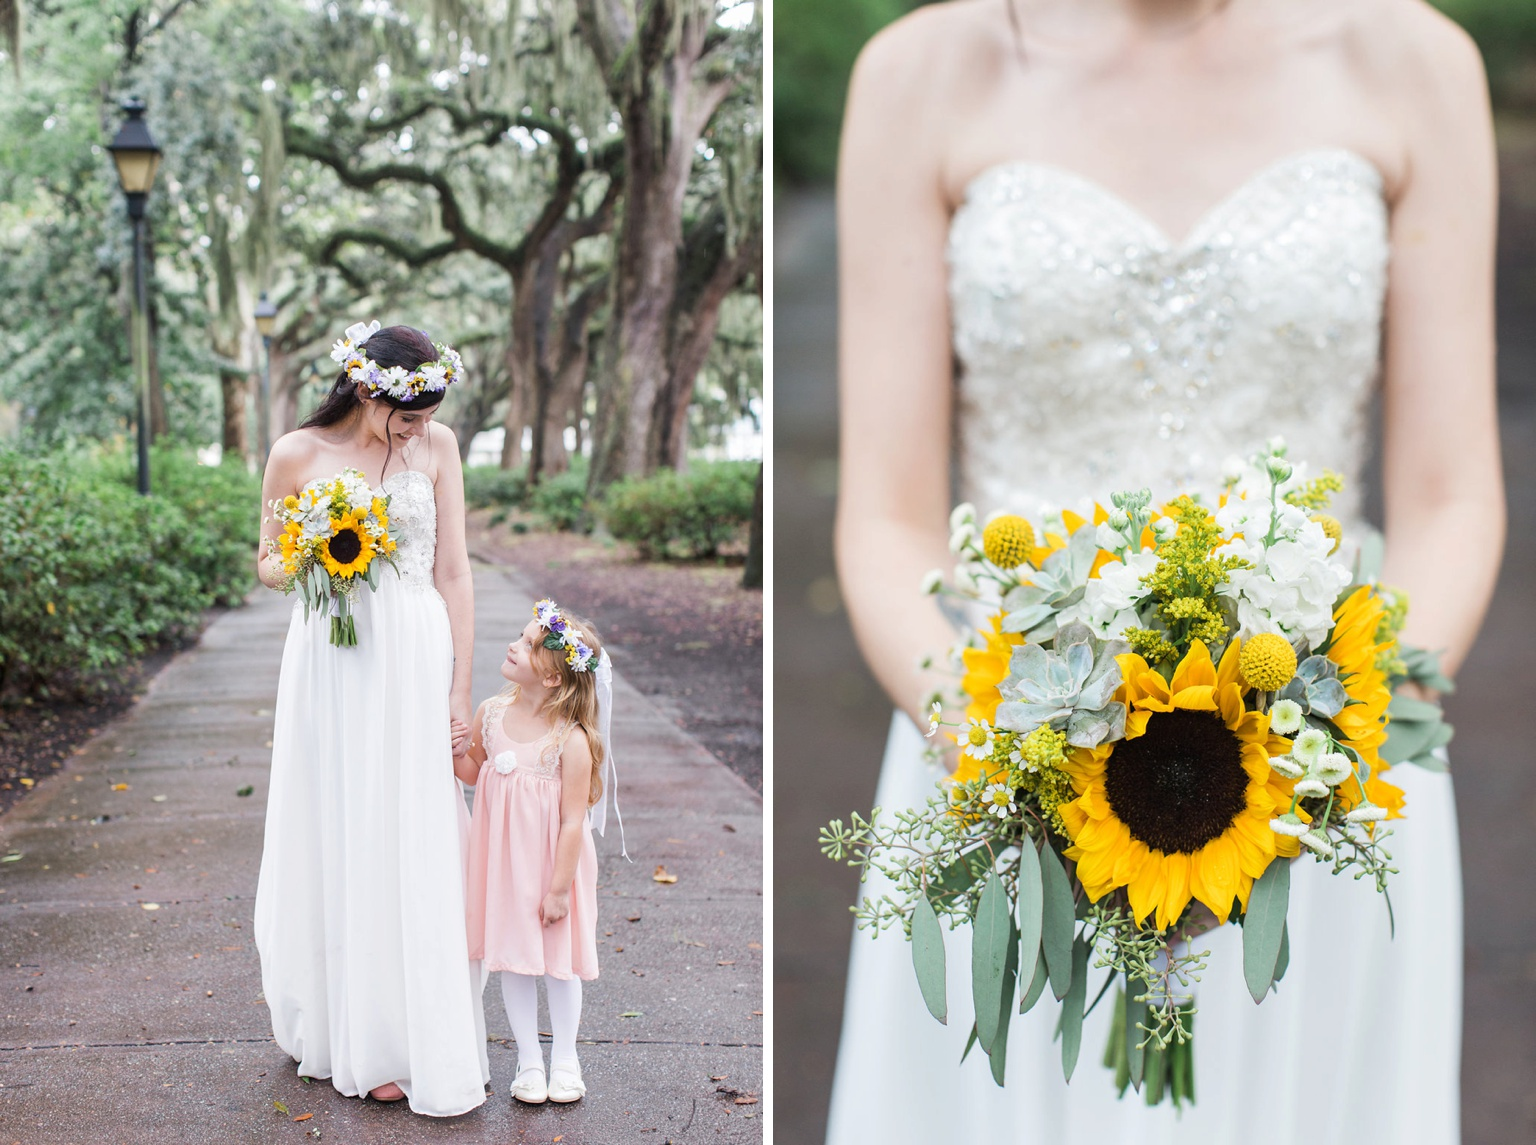 Apt_B_Photo_Savannah_Wedding_Photographer_Flower_Crown039.JPG